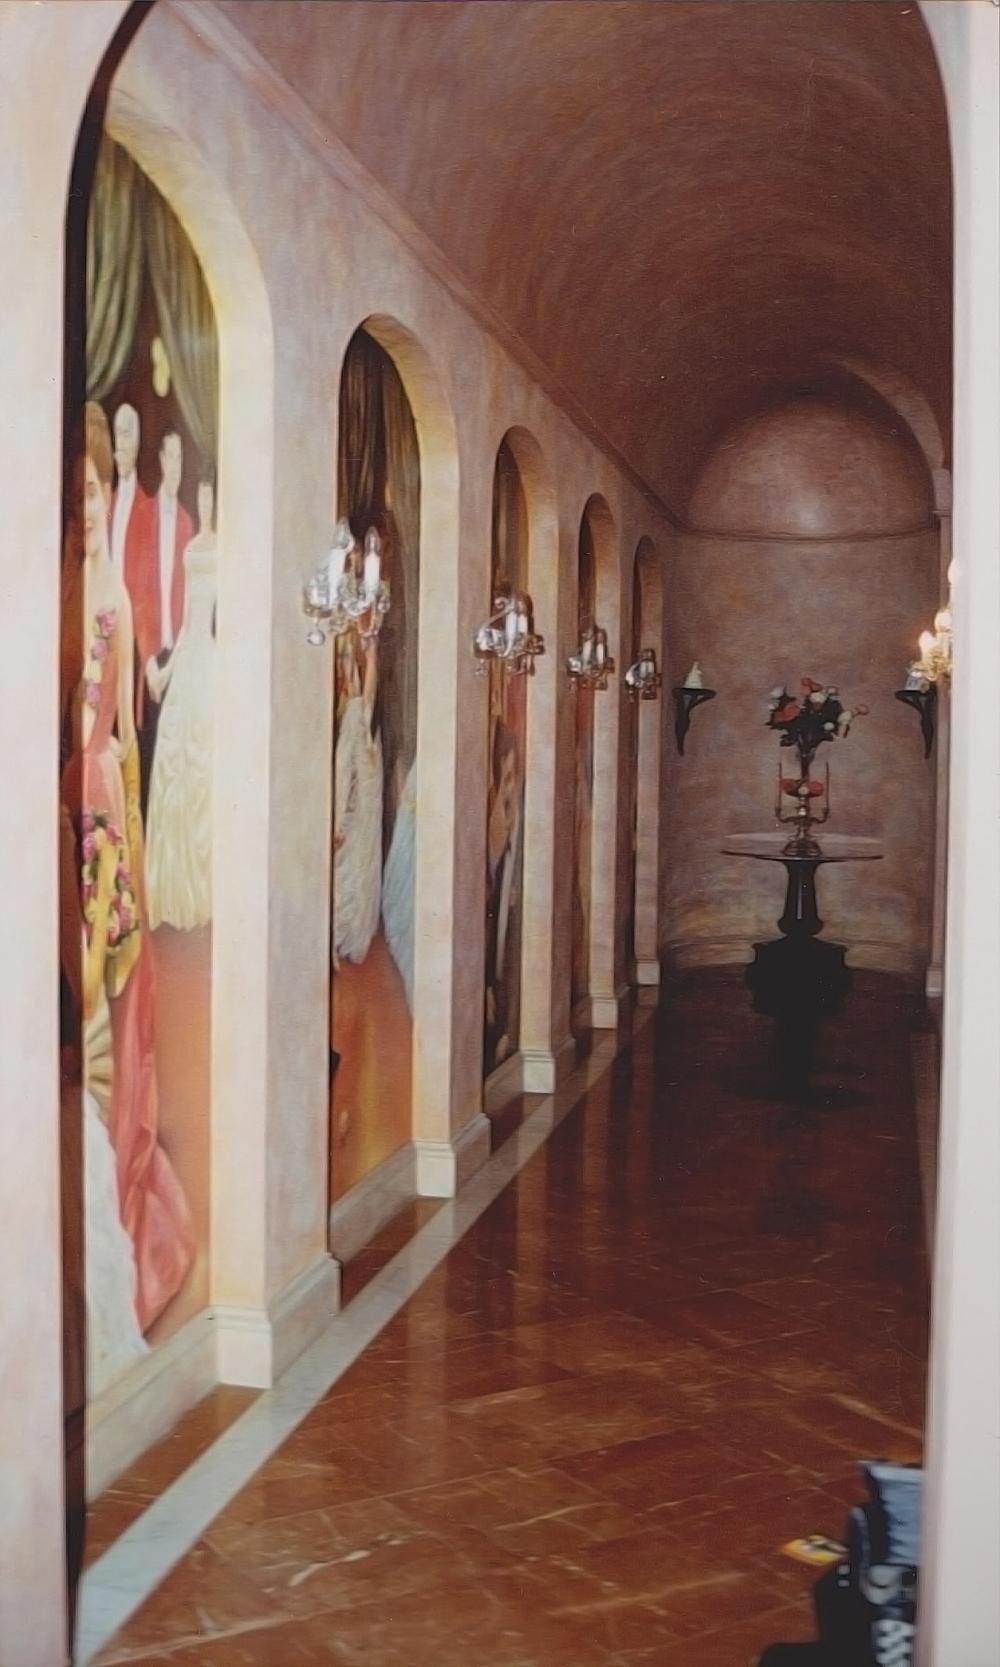 thornton_skase_house_mural_1993